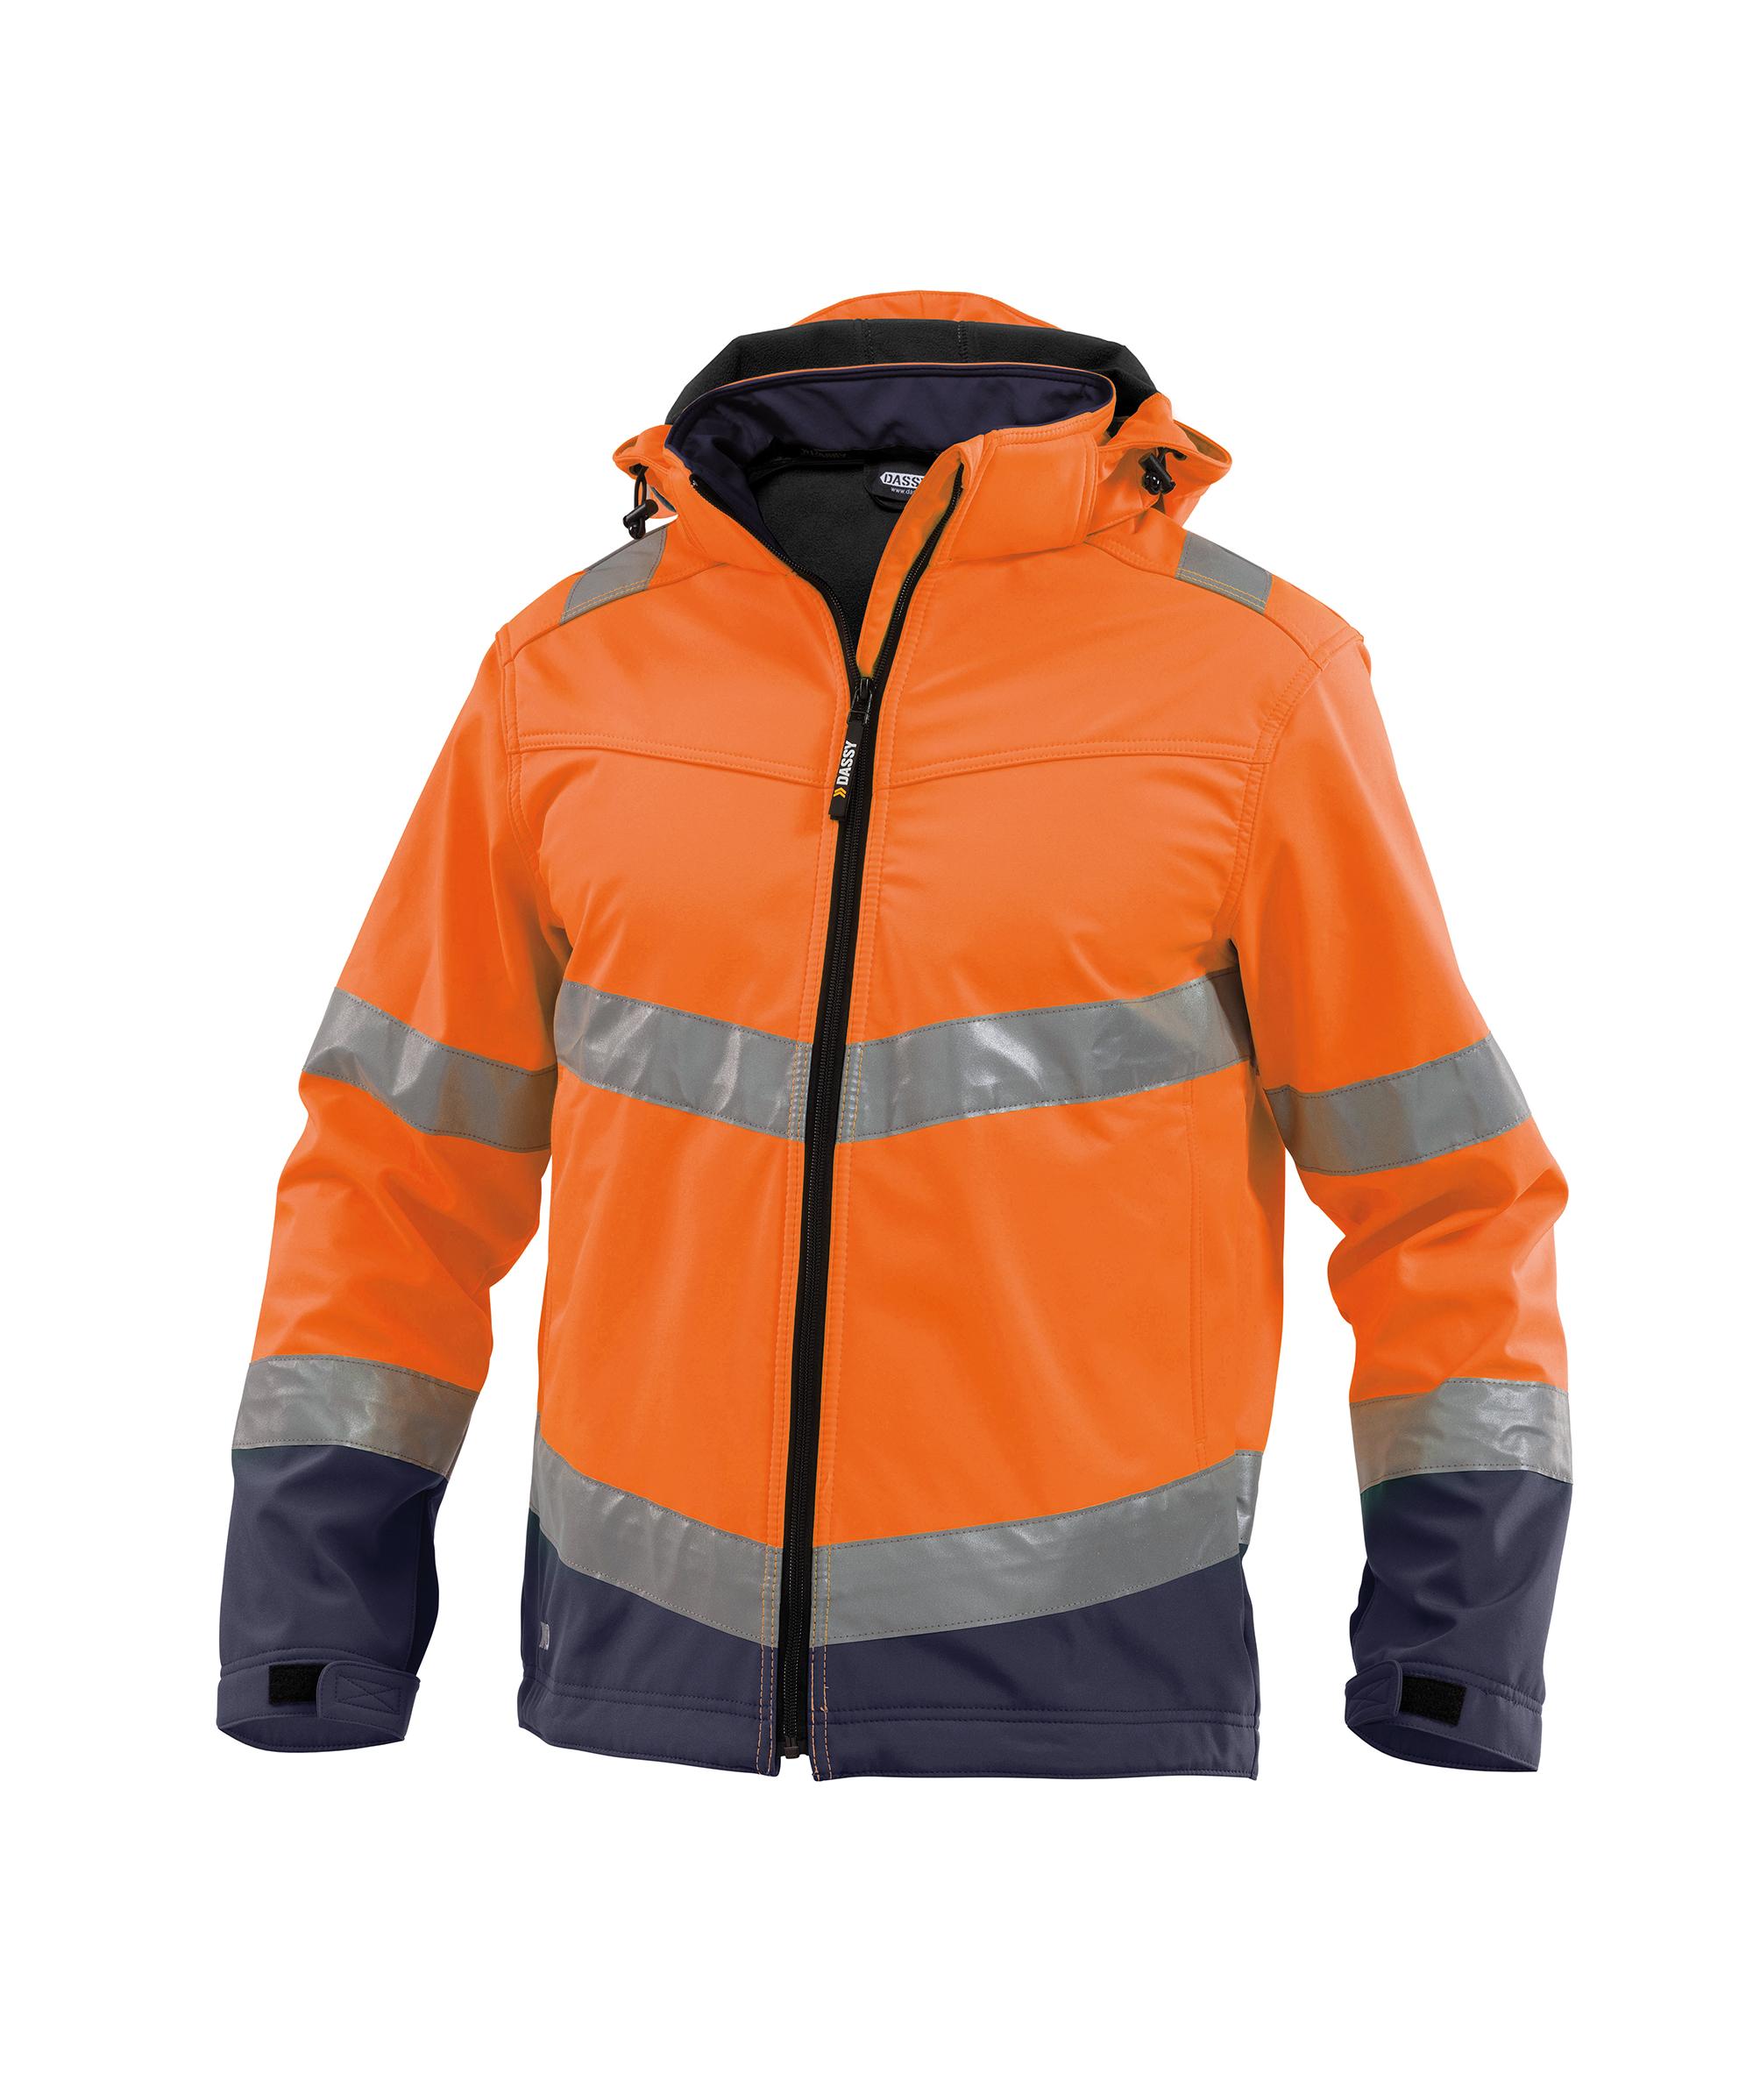 Dassy, Malaga Warnschutz Softshell-Jacke 300329